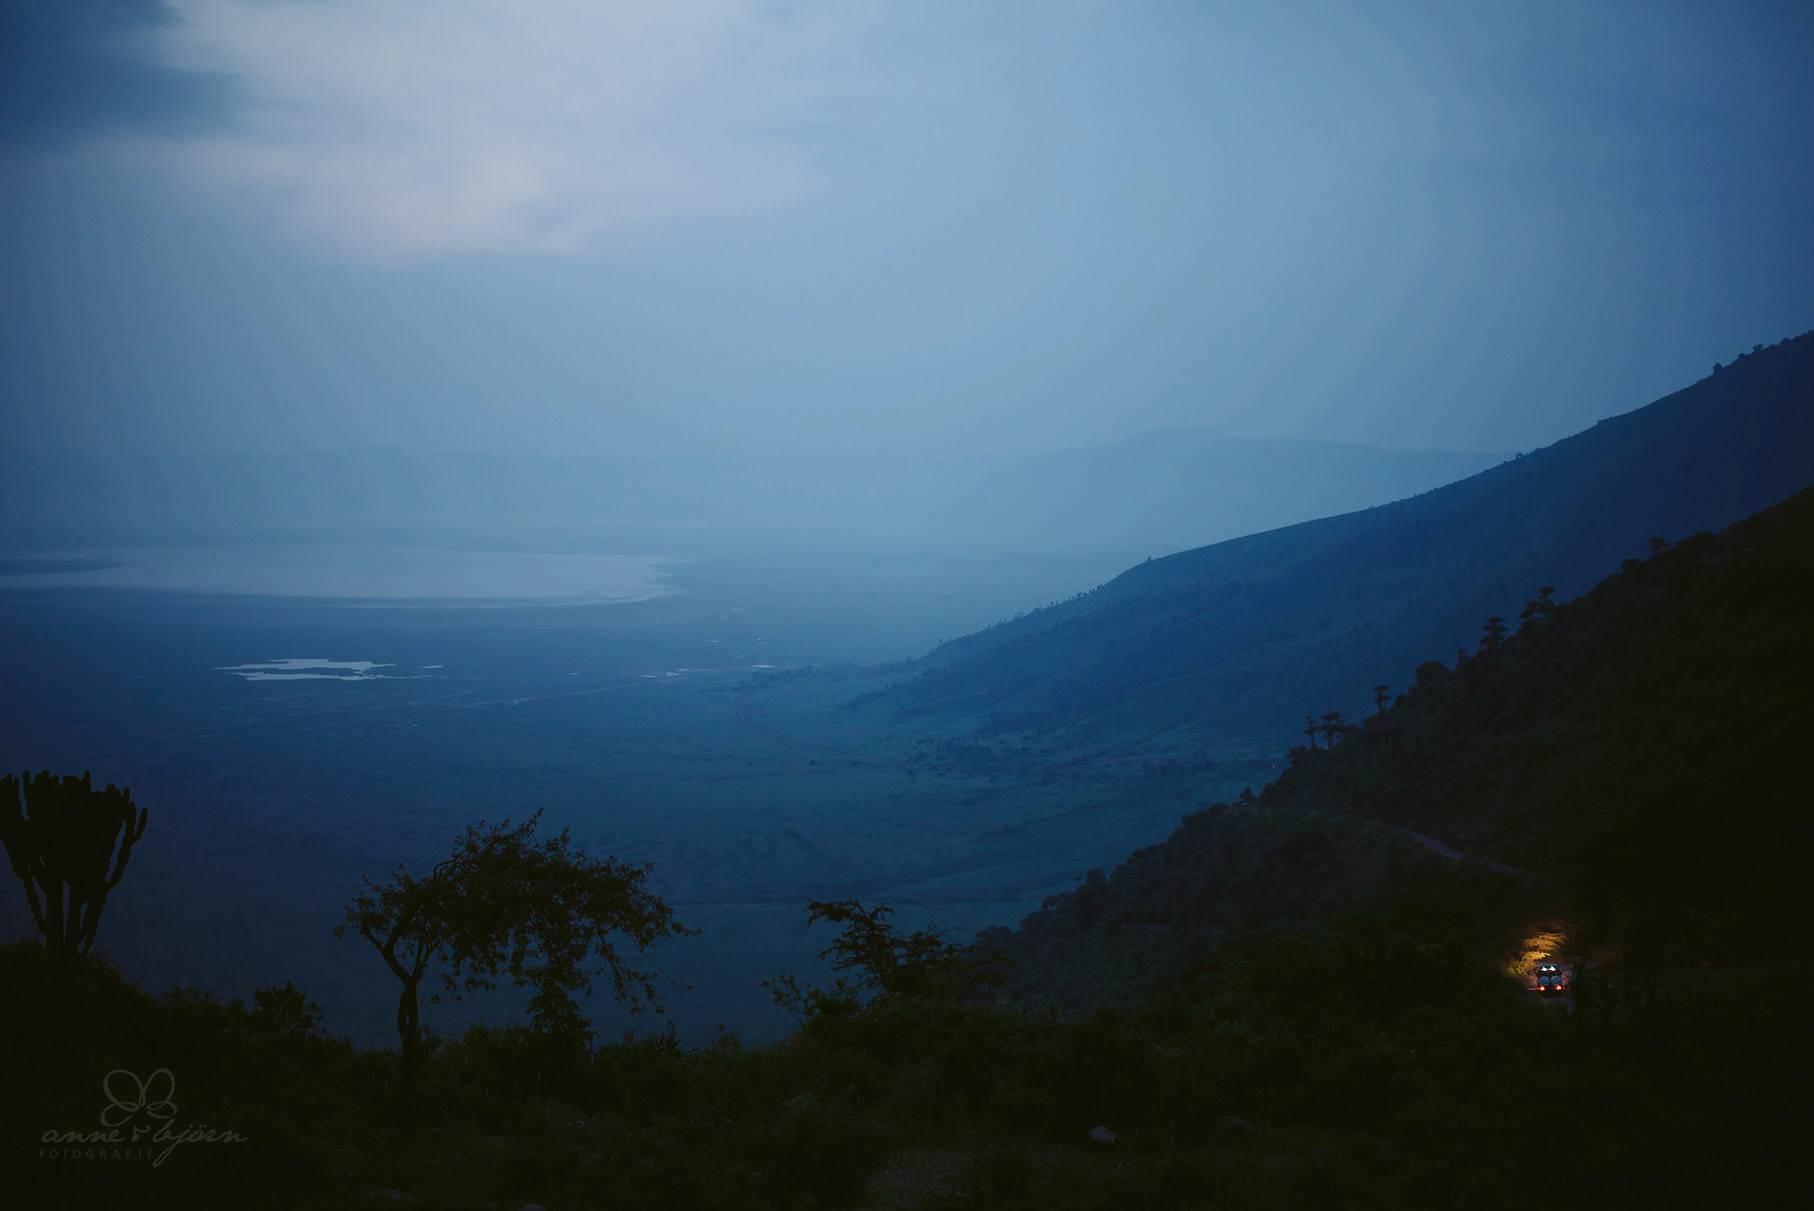 0050 tansania nd8 1348 anne bjoern fotografie hochzeitsfotograf hamburg - This is Tanzania - Serengeti, Kilimanjaro & Sansibar